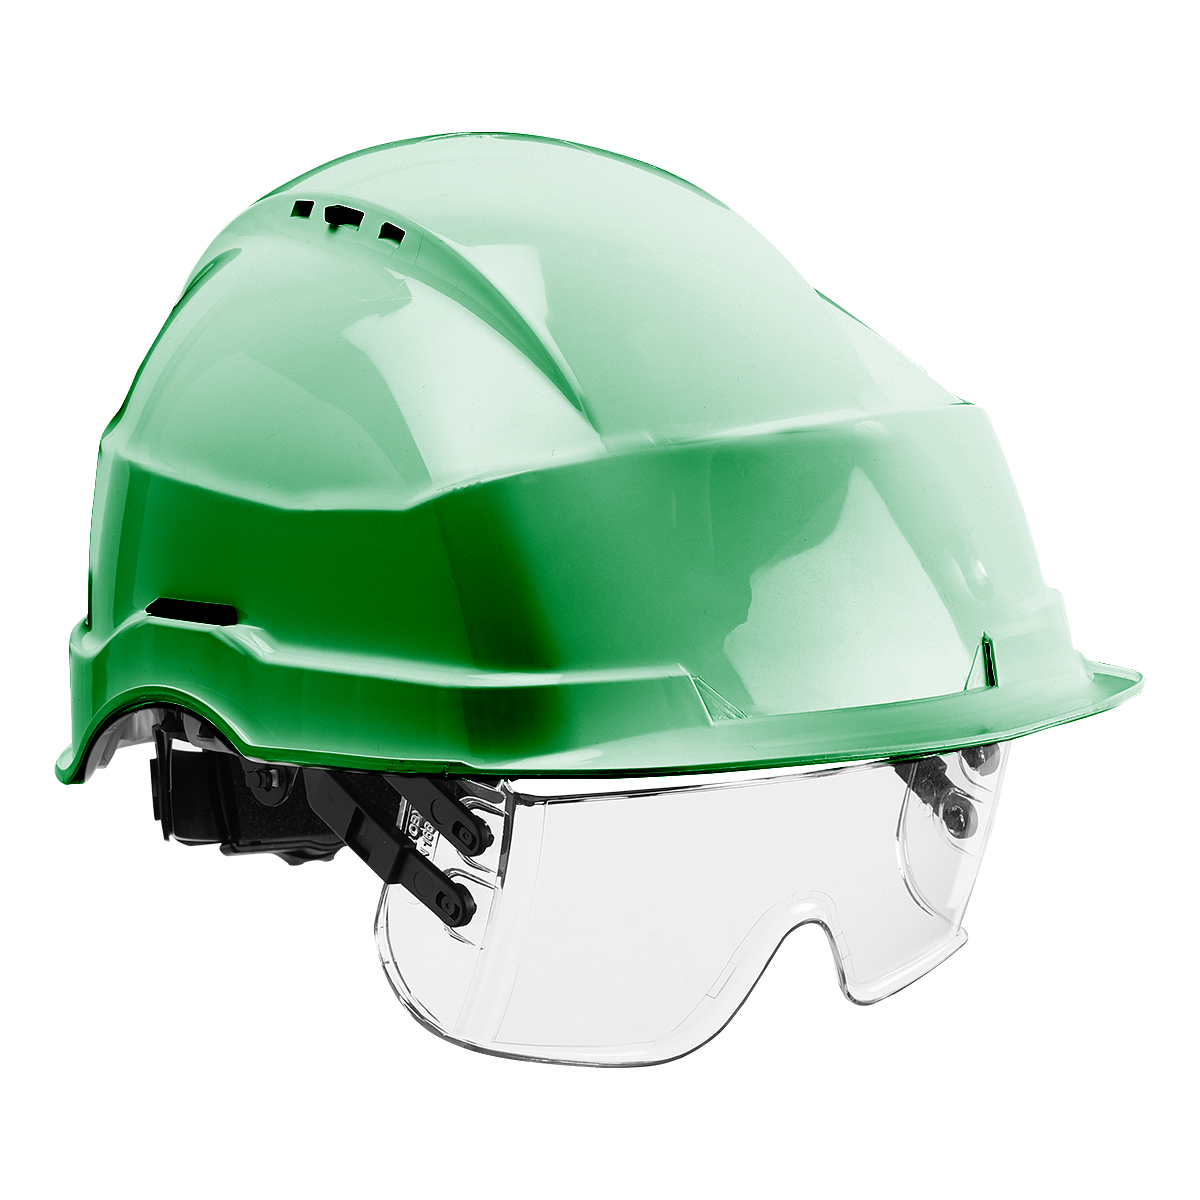 HF0510_Iris II Safety Helmet and Visor_Green